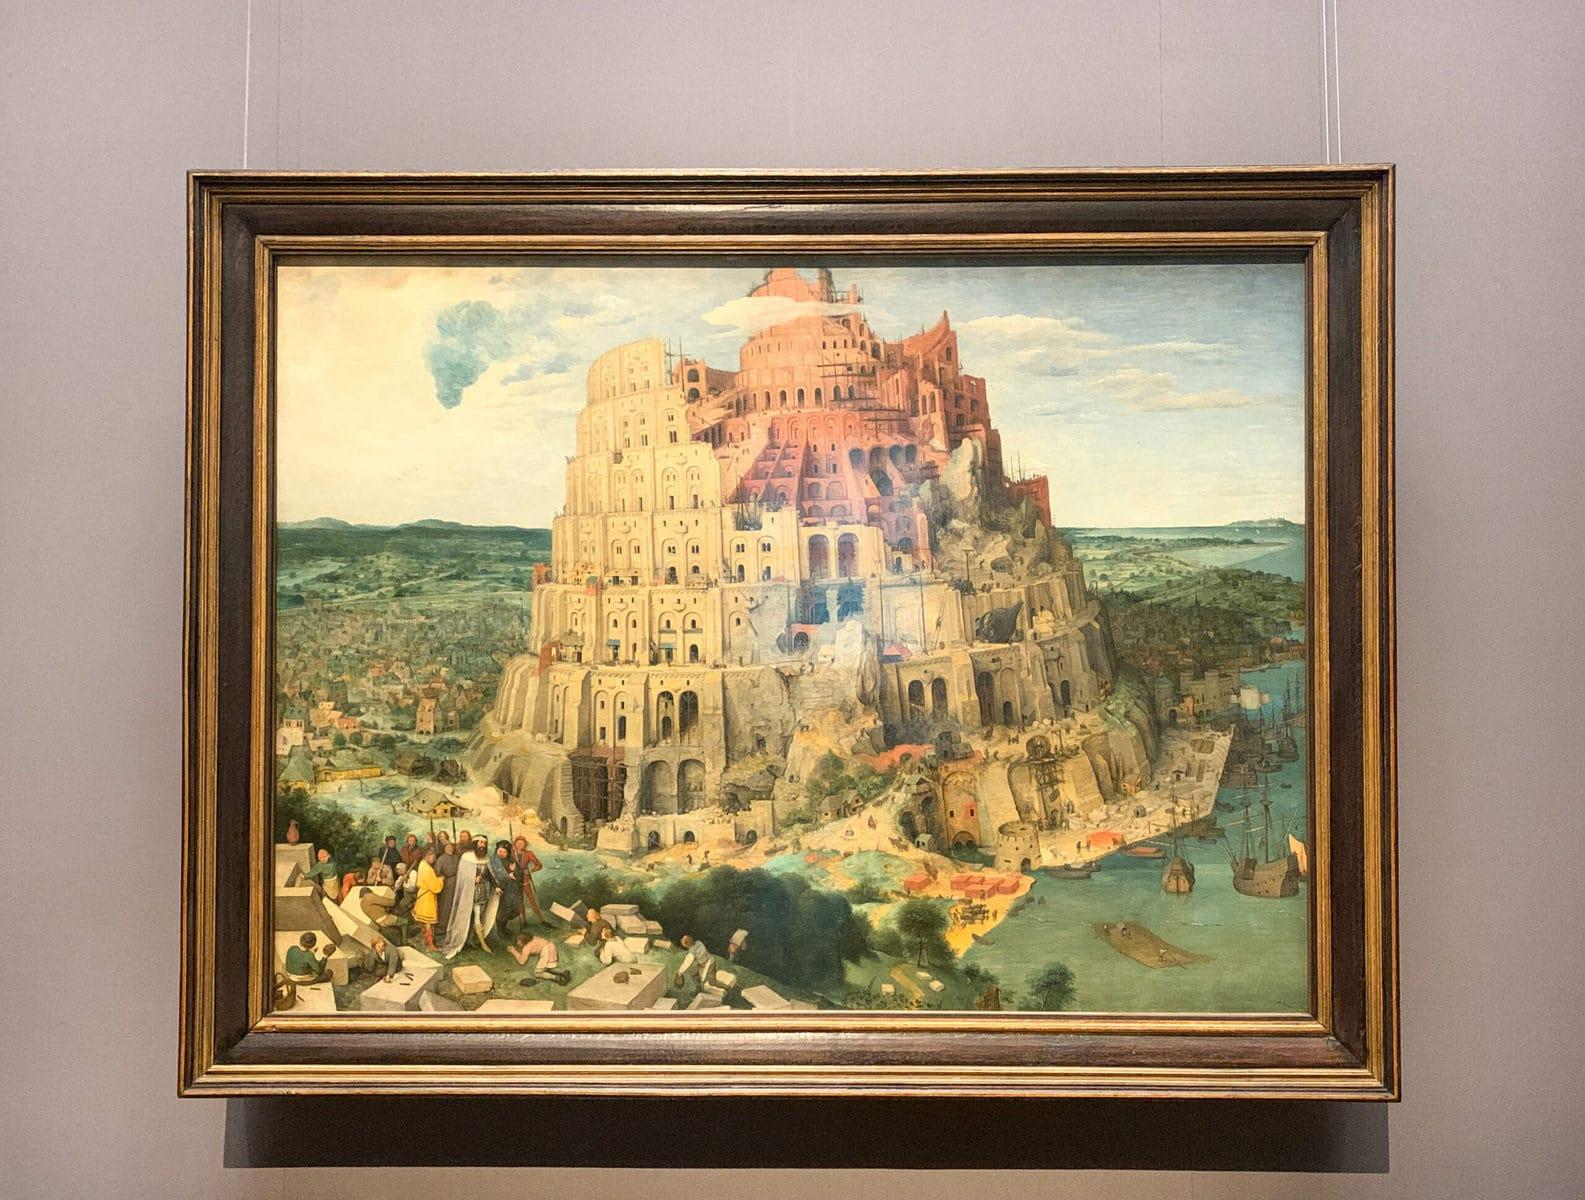 Pieter Brueghel: Turmbau zu Babel, Kunsthistorisches Museum Wien